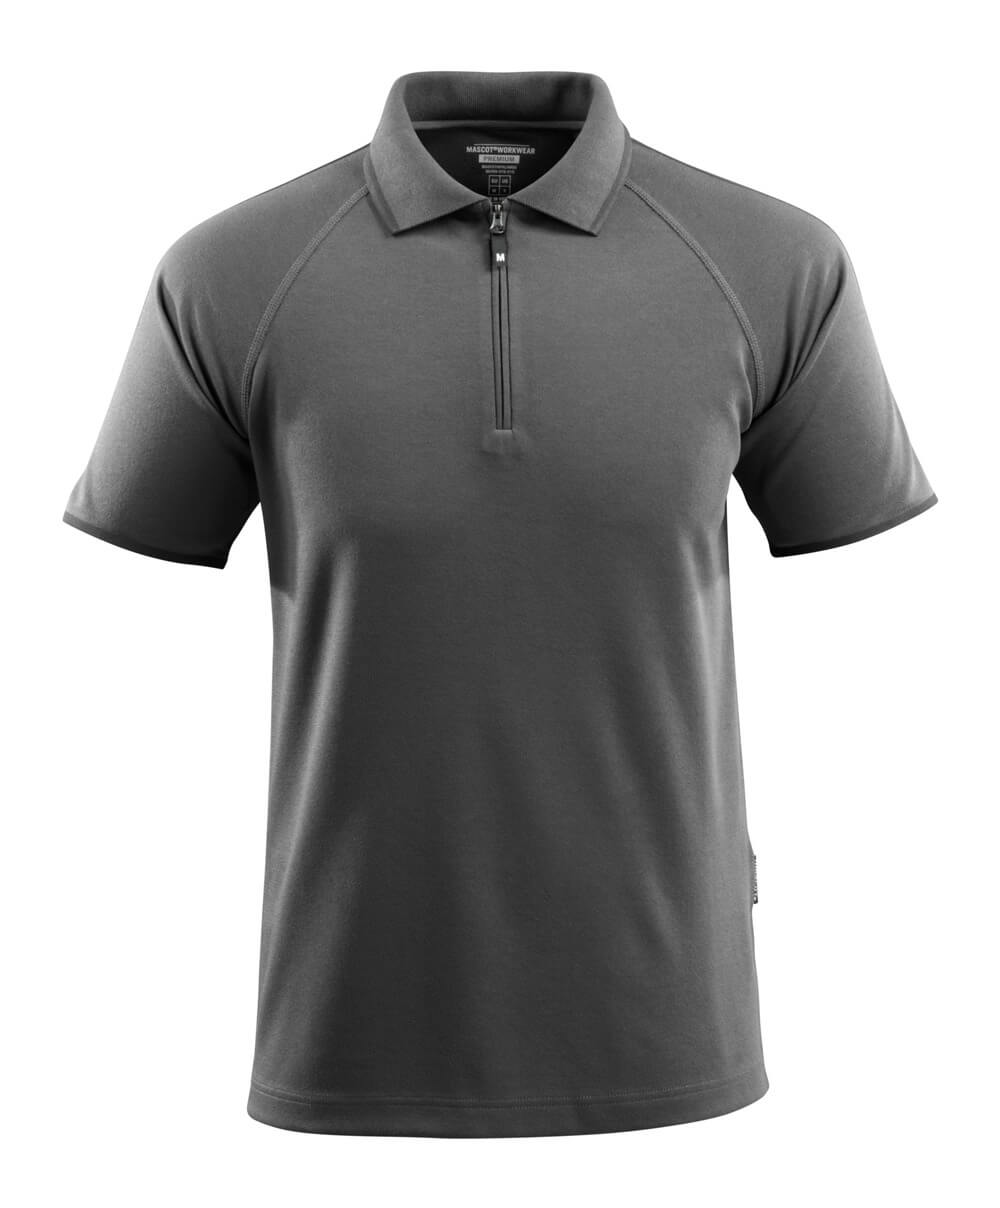 50458-978-18 Poloshirt - mørk antracit